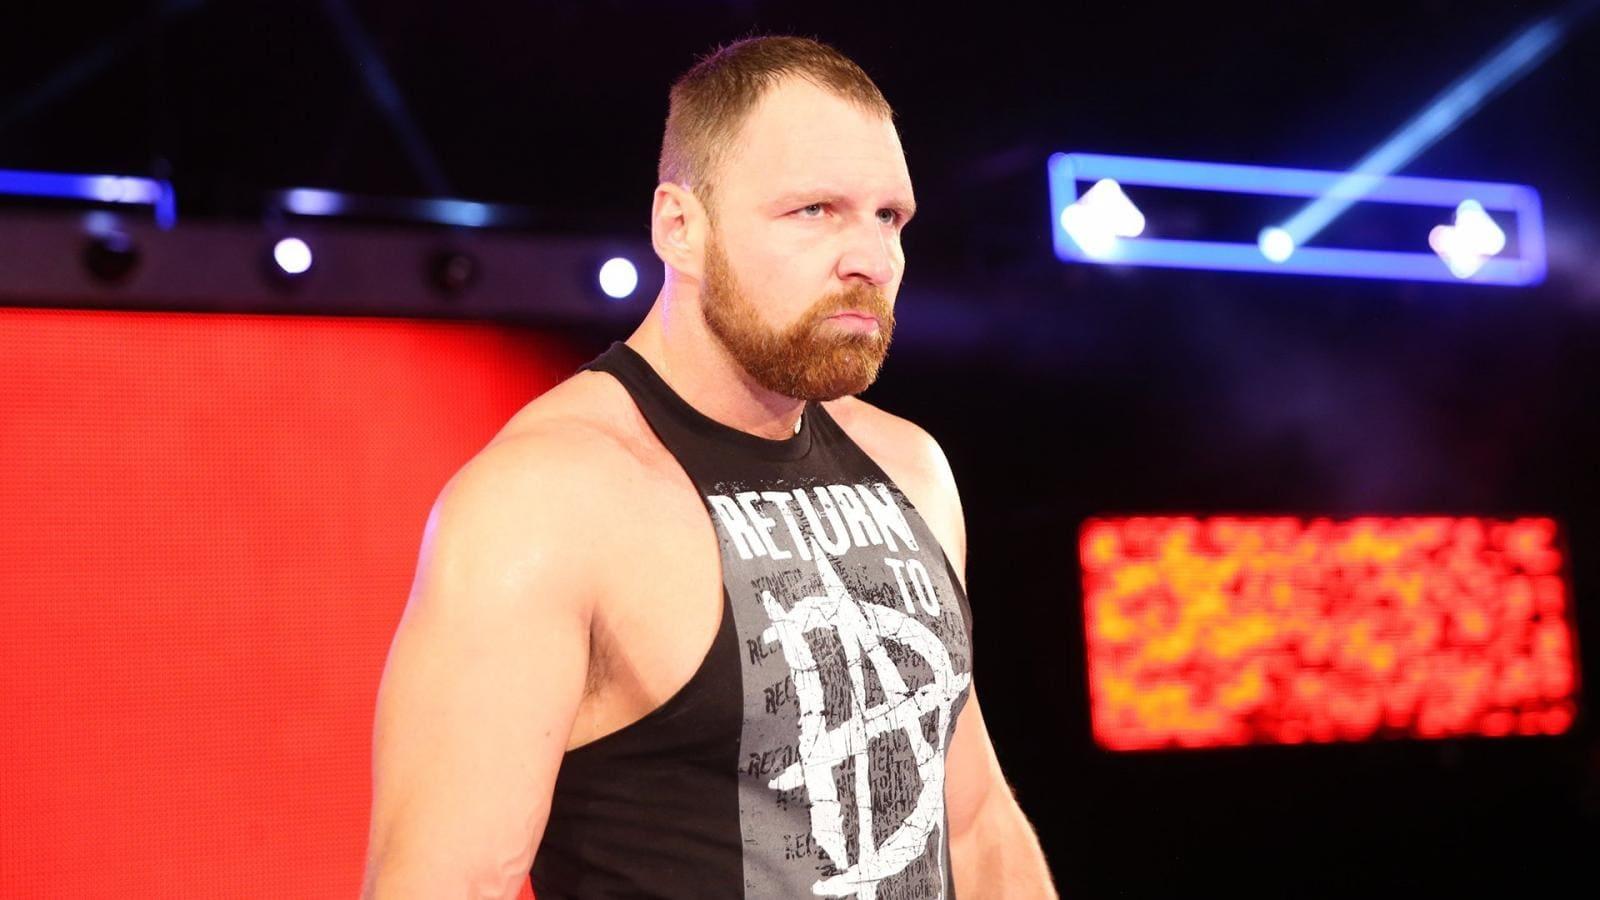 WWE Raw - Season 26 Episode 33 : August 13, 2018 (Greensboro, NC) (1970)